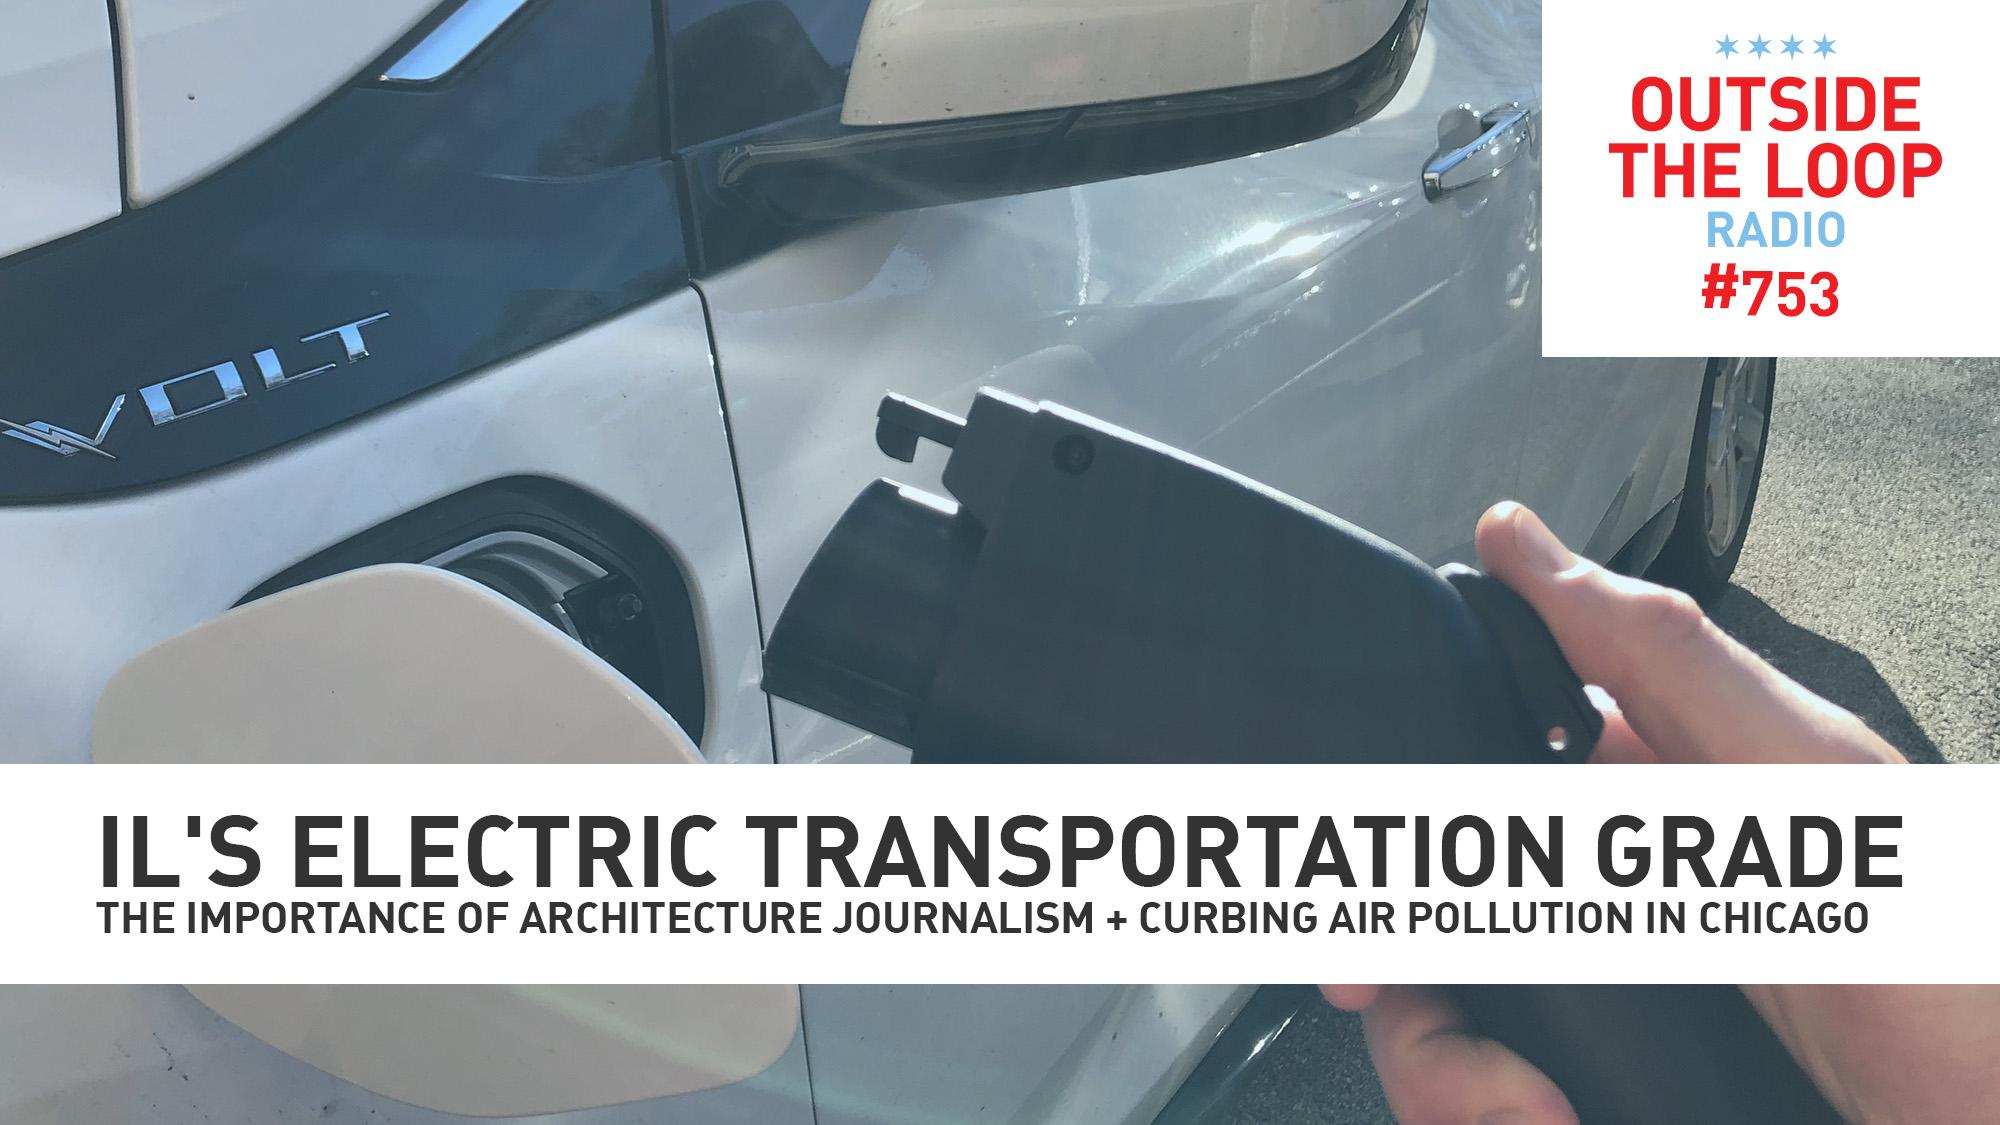 Electric transportation. (Photo courtesy of Collin Seaman/WGN Radio).